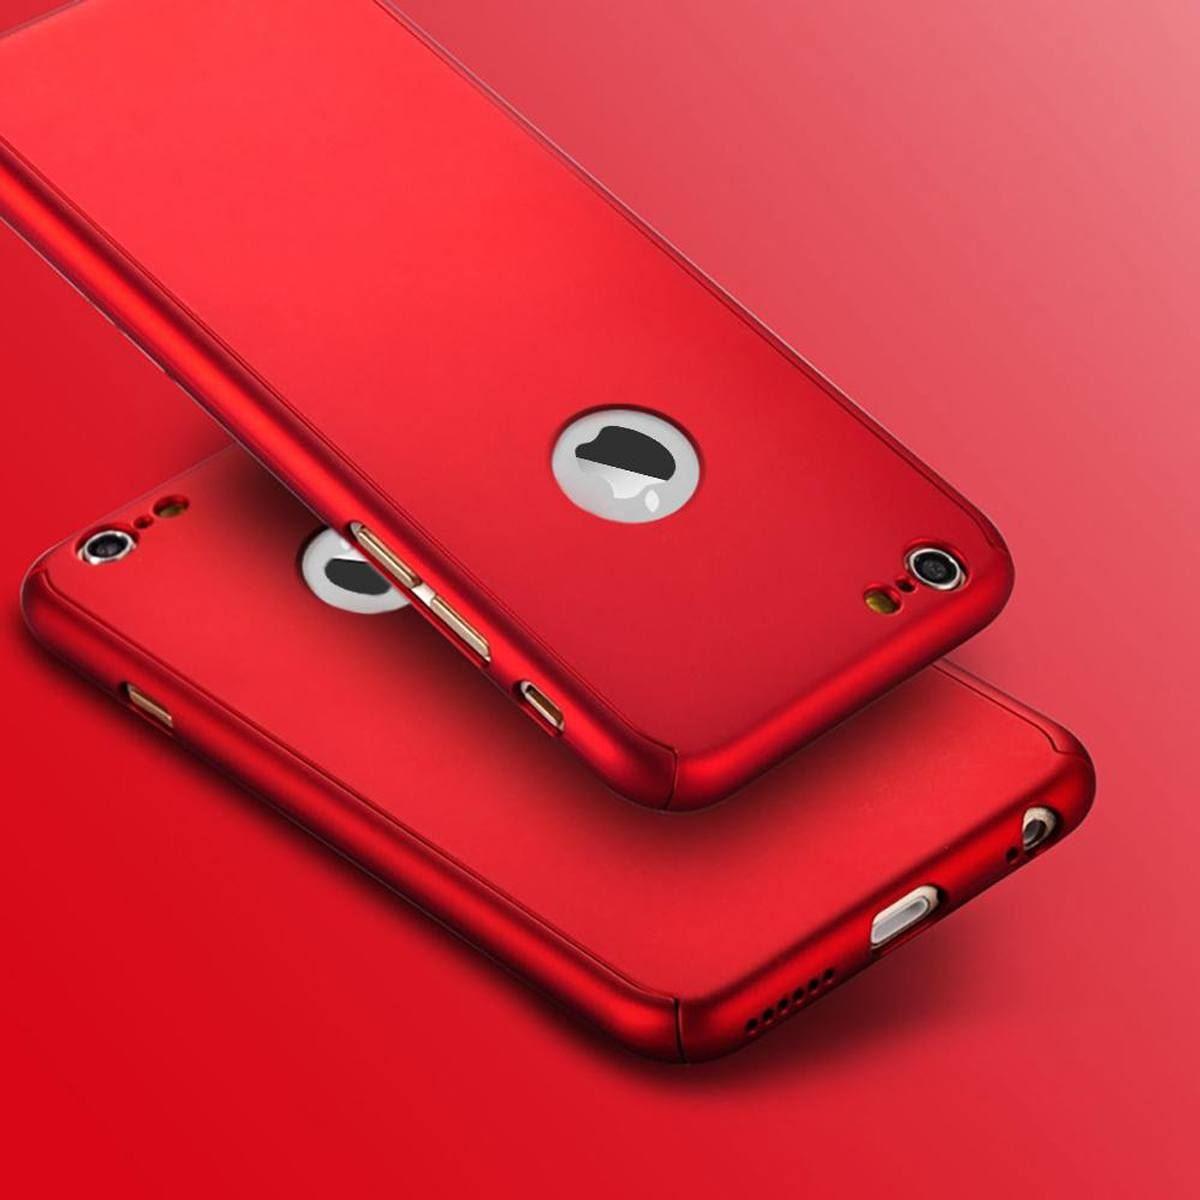 For-Apple-iPhone-XS-Max-XR-Hybrid-360-Slim-Ultra-Thin-Heavy-Duty-Shockproof-Case Indexbild 38